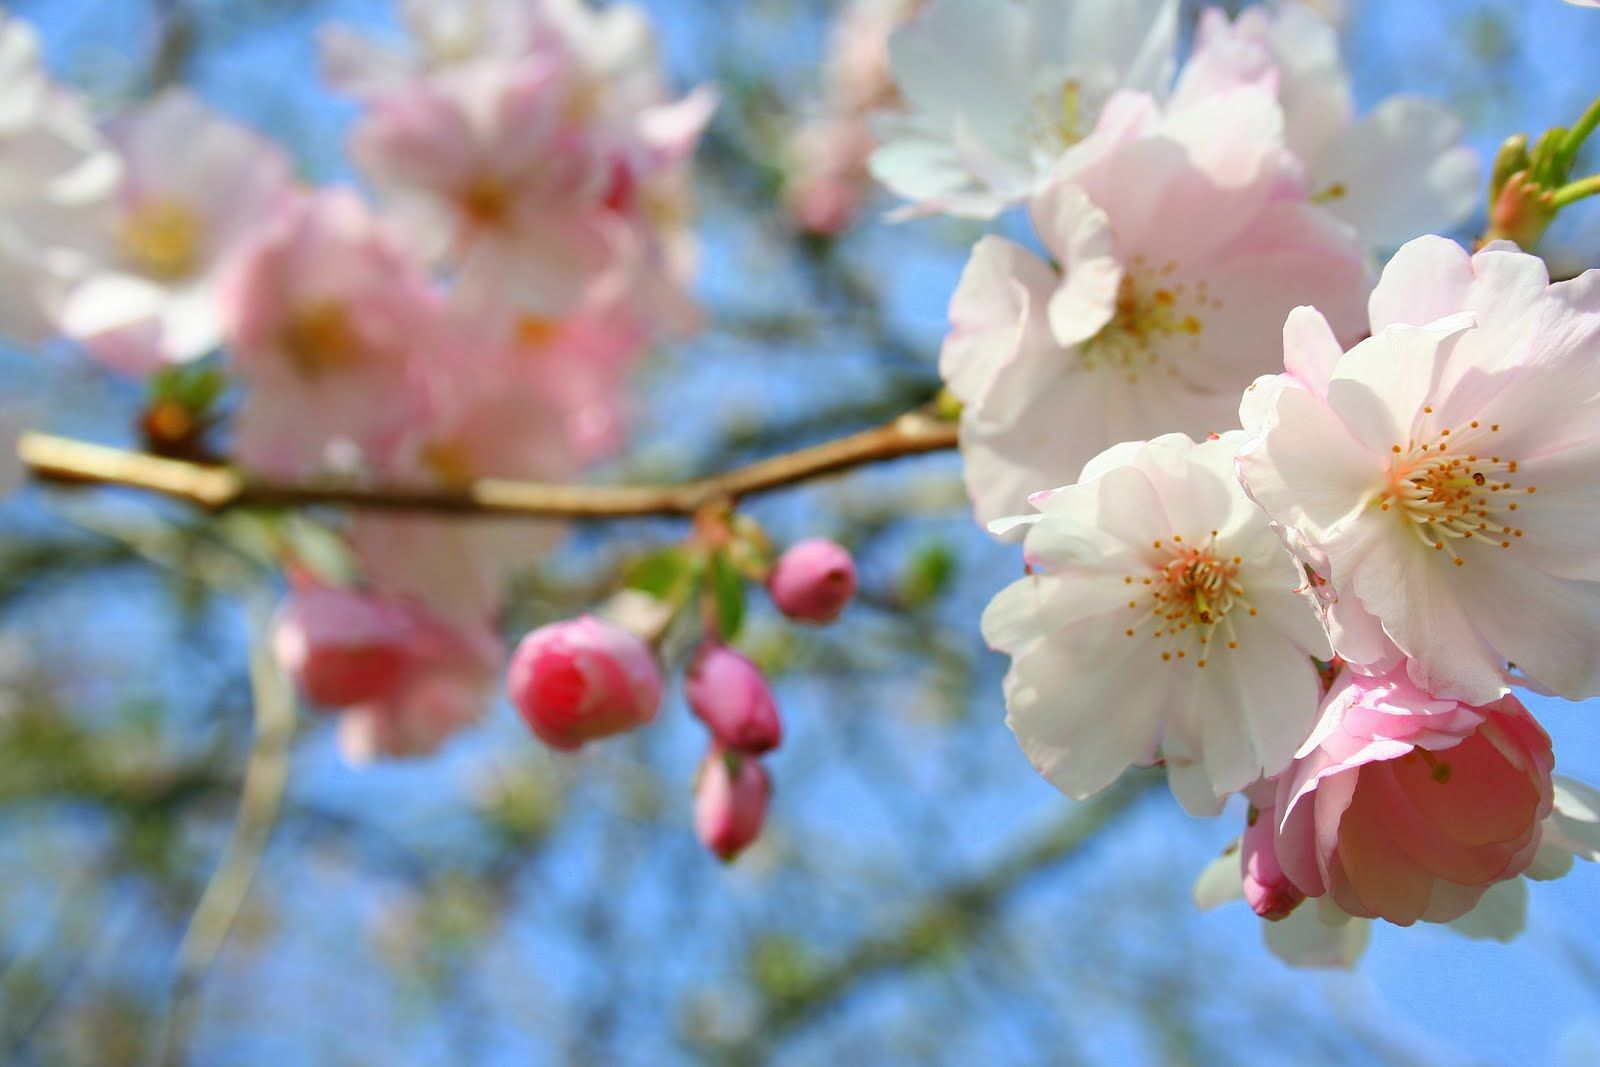 Spring Persian Basmati Rice Recipe Sour Cherry Rice Recipe Vegetarian Rice Recipe Saffron And Sour Cherries Ornamental Cherry Cherry Blooms Flowering Trees